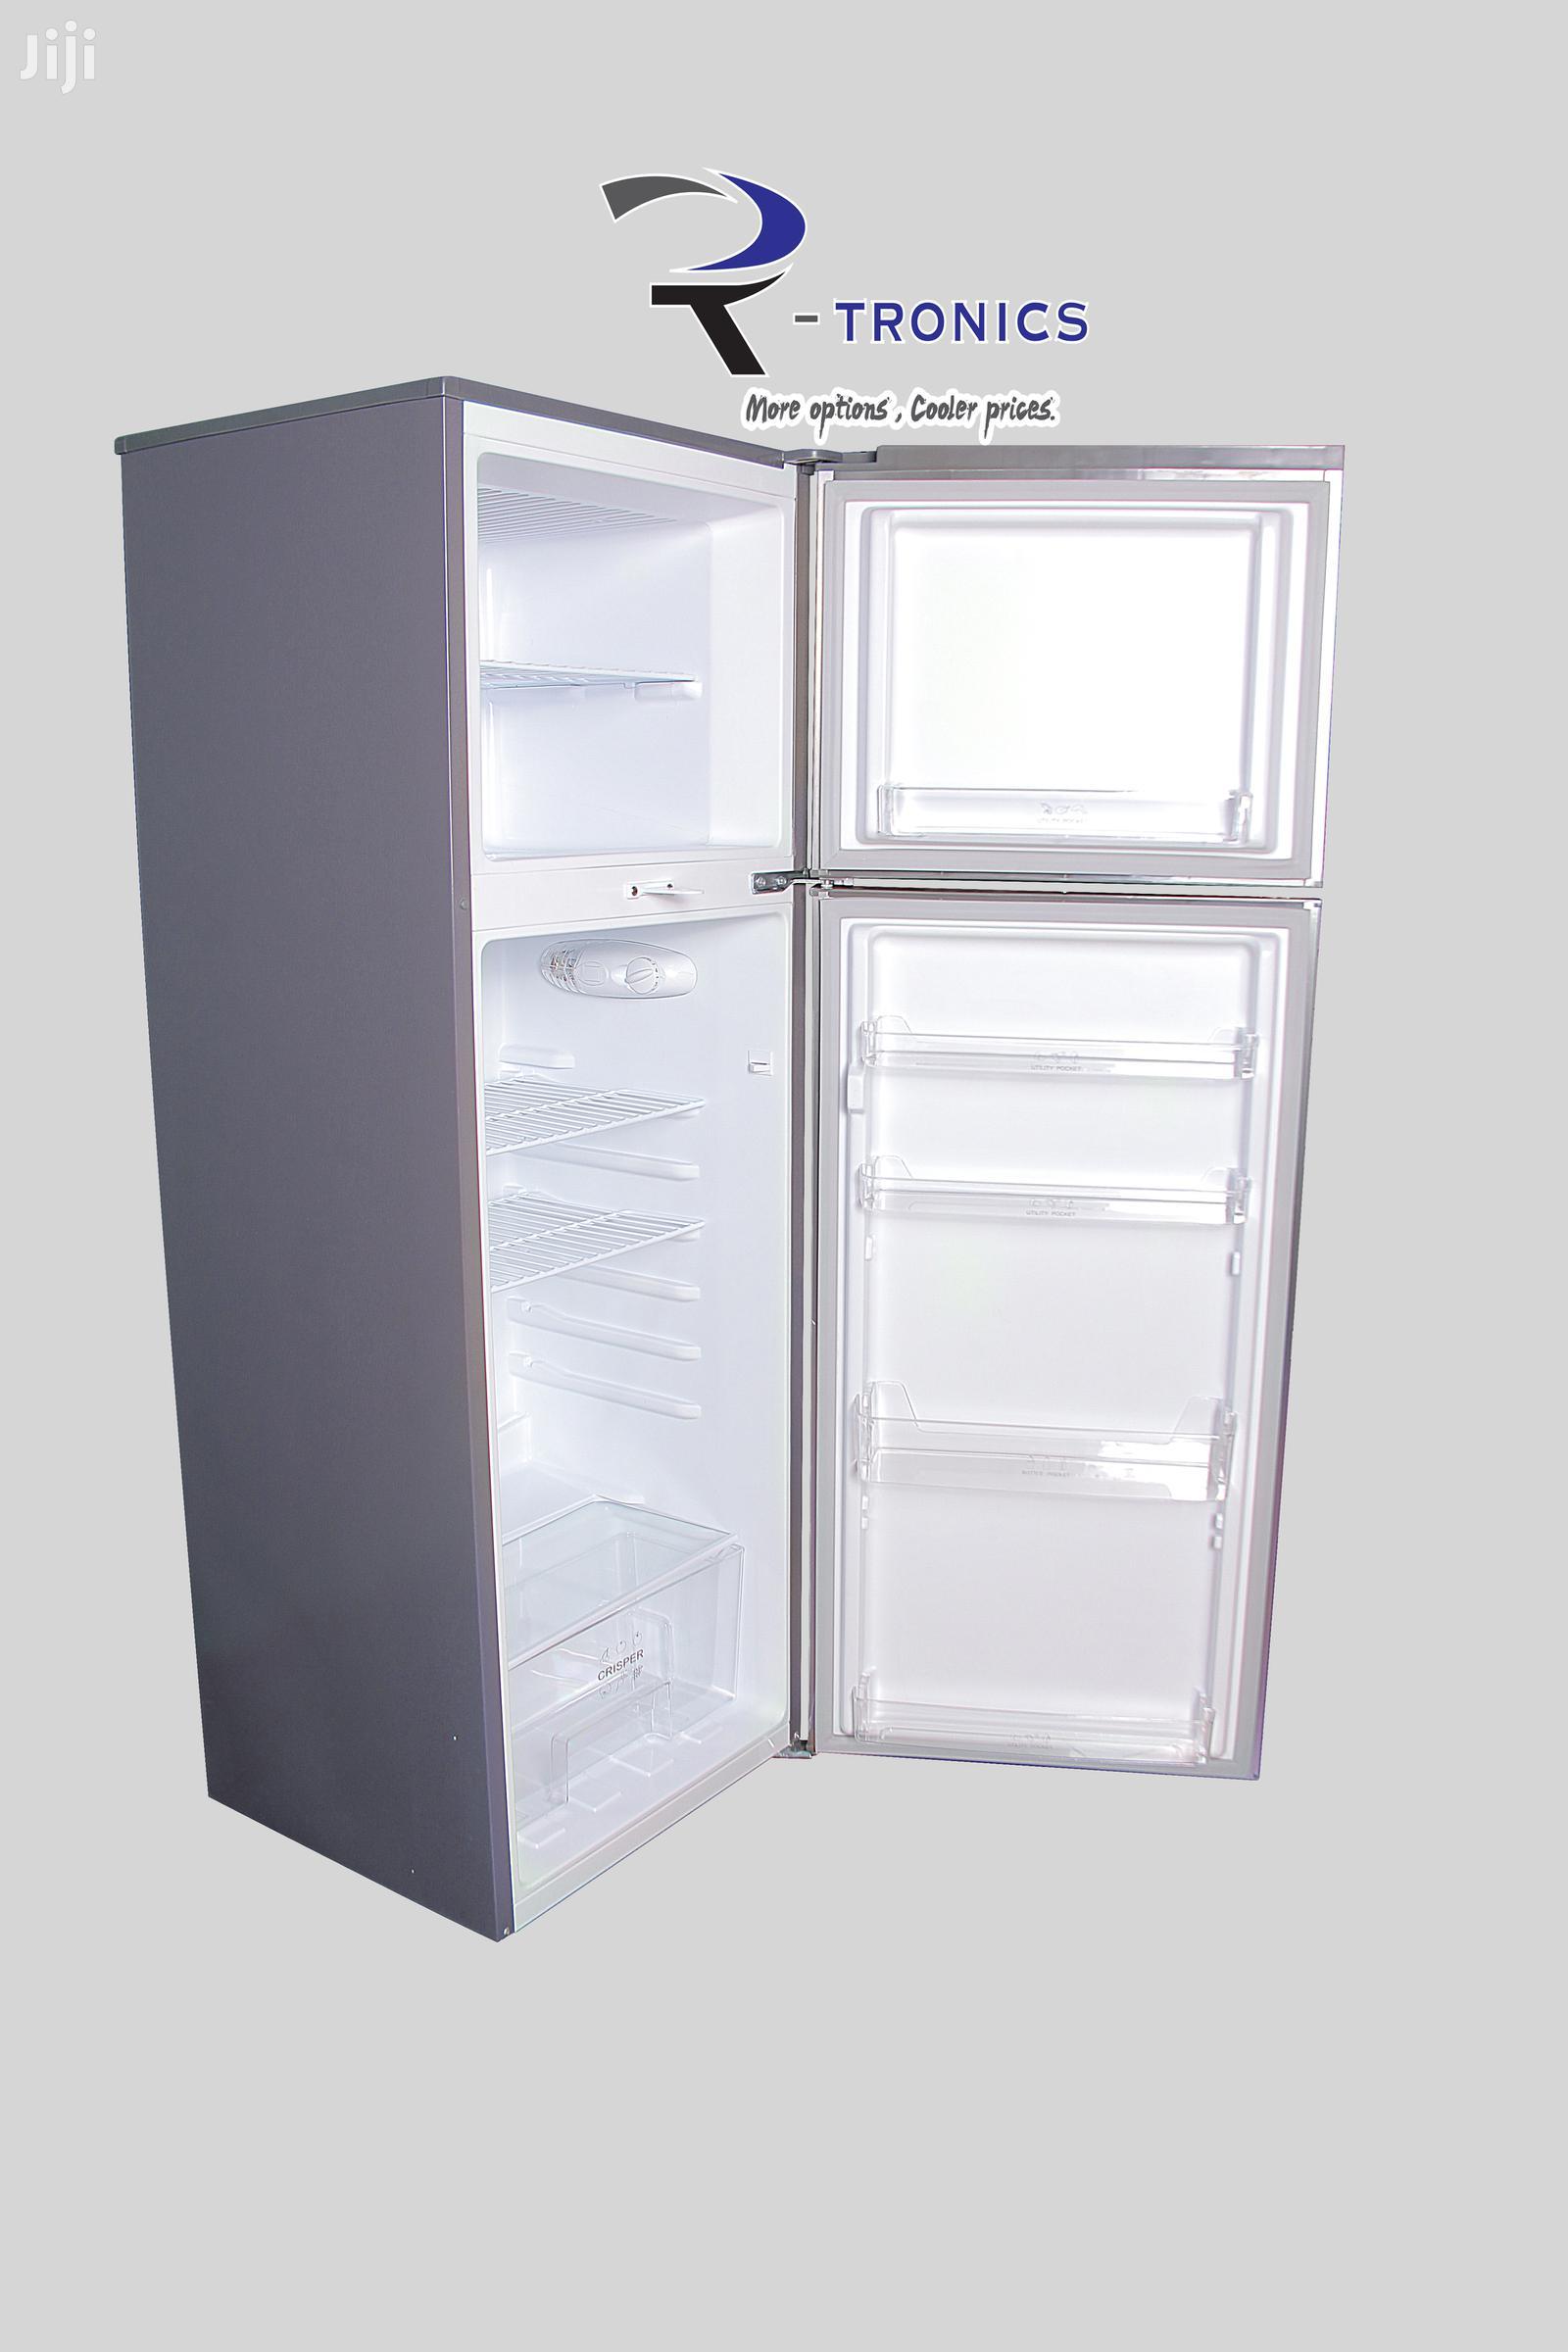 Westpoint Double Door Defrost, Refrigerator 200L Net / 240 Gross | Kitchen Appliances for sale in Kinondoni, Dar es Salaam, Tanzania